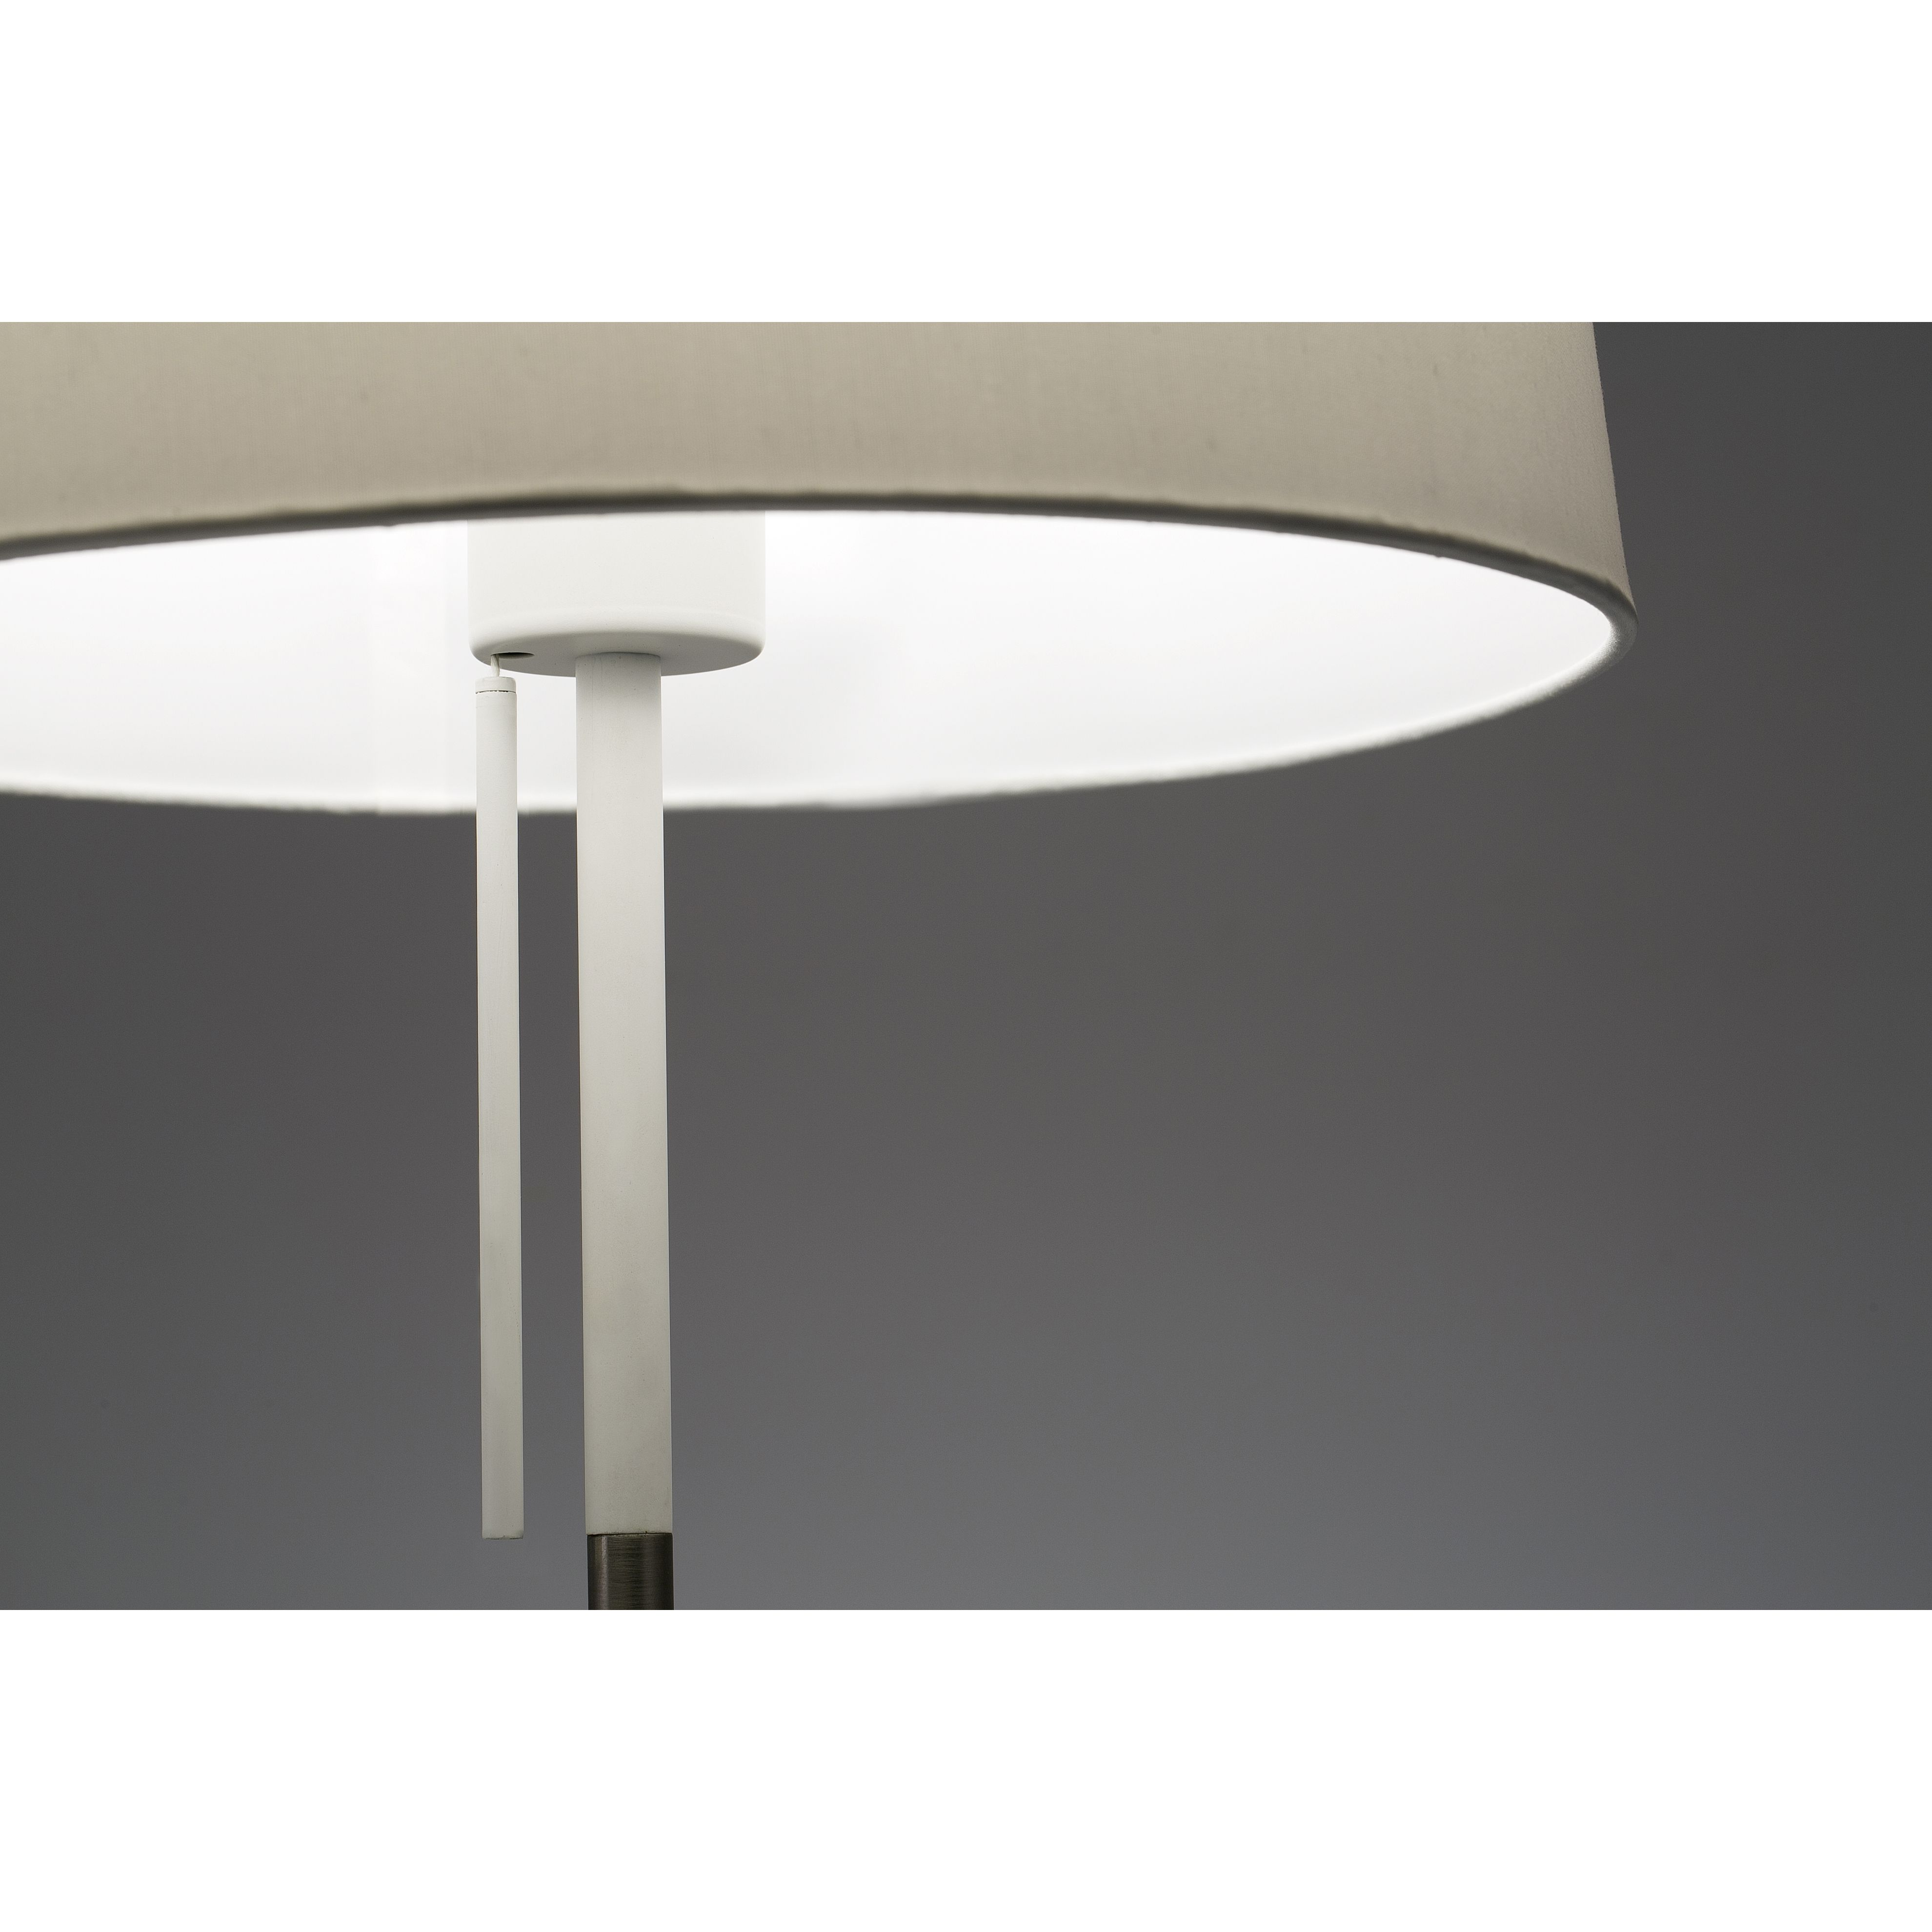 VOLTA white table lamp